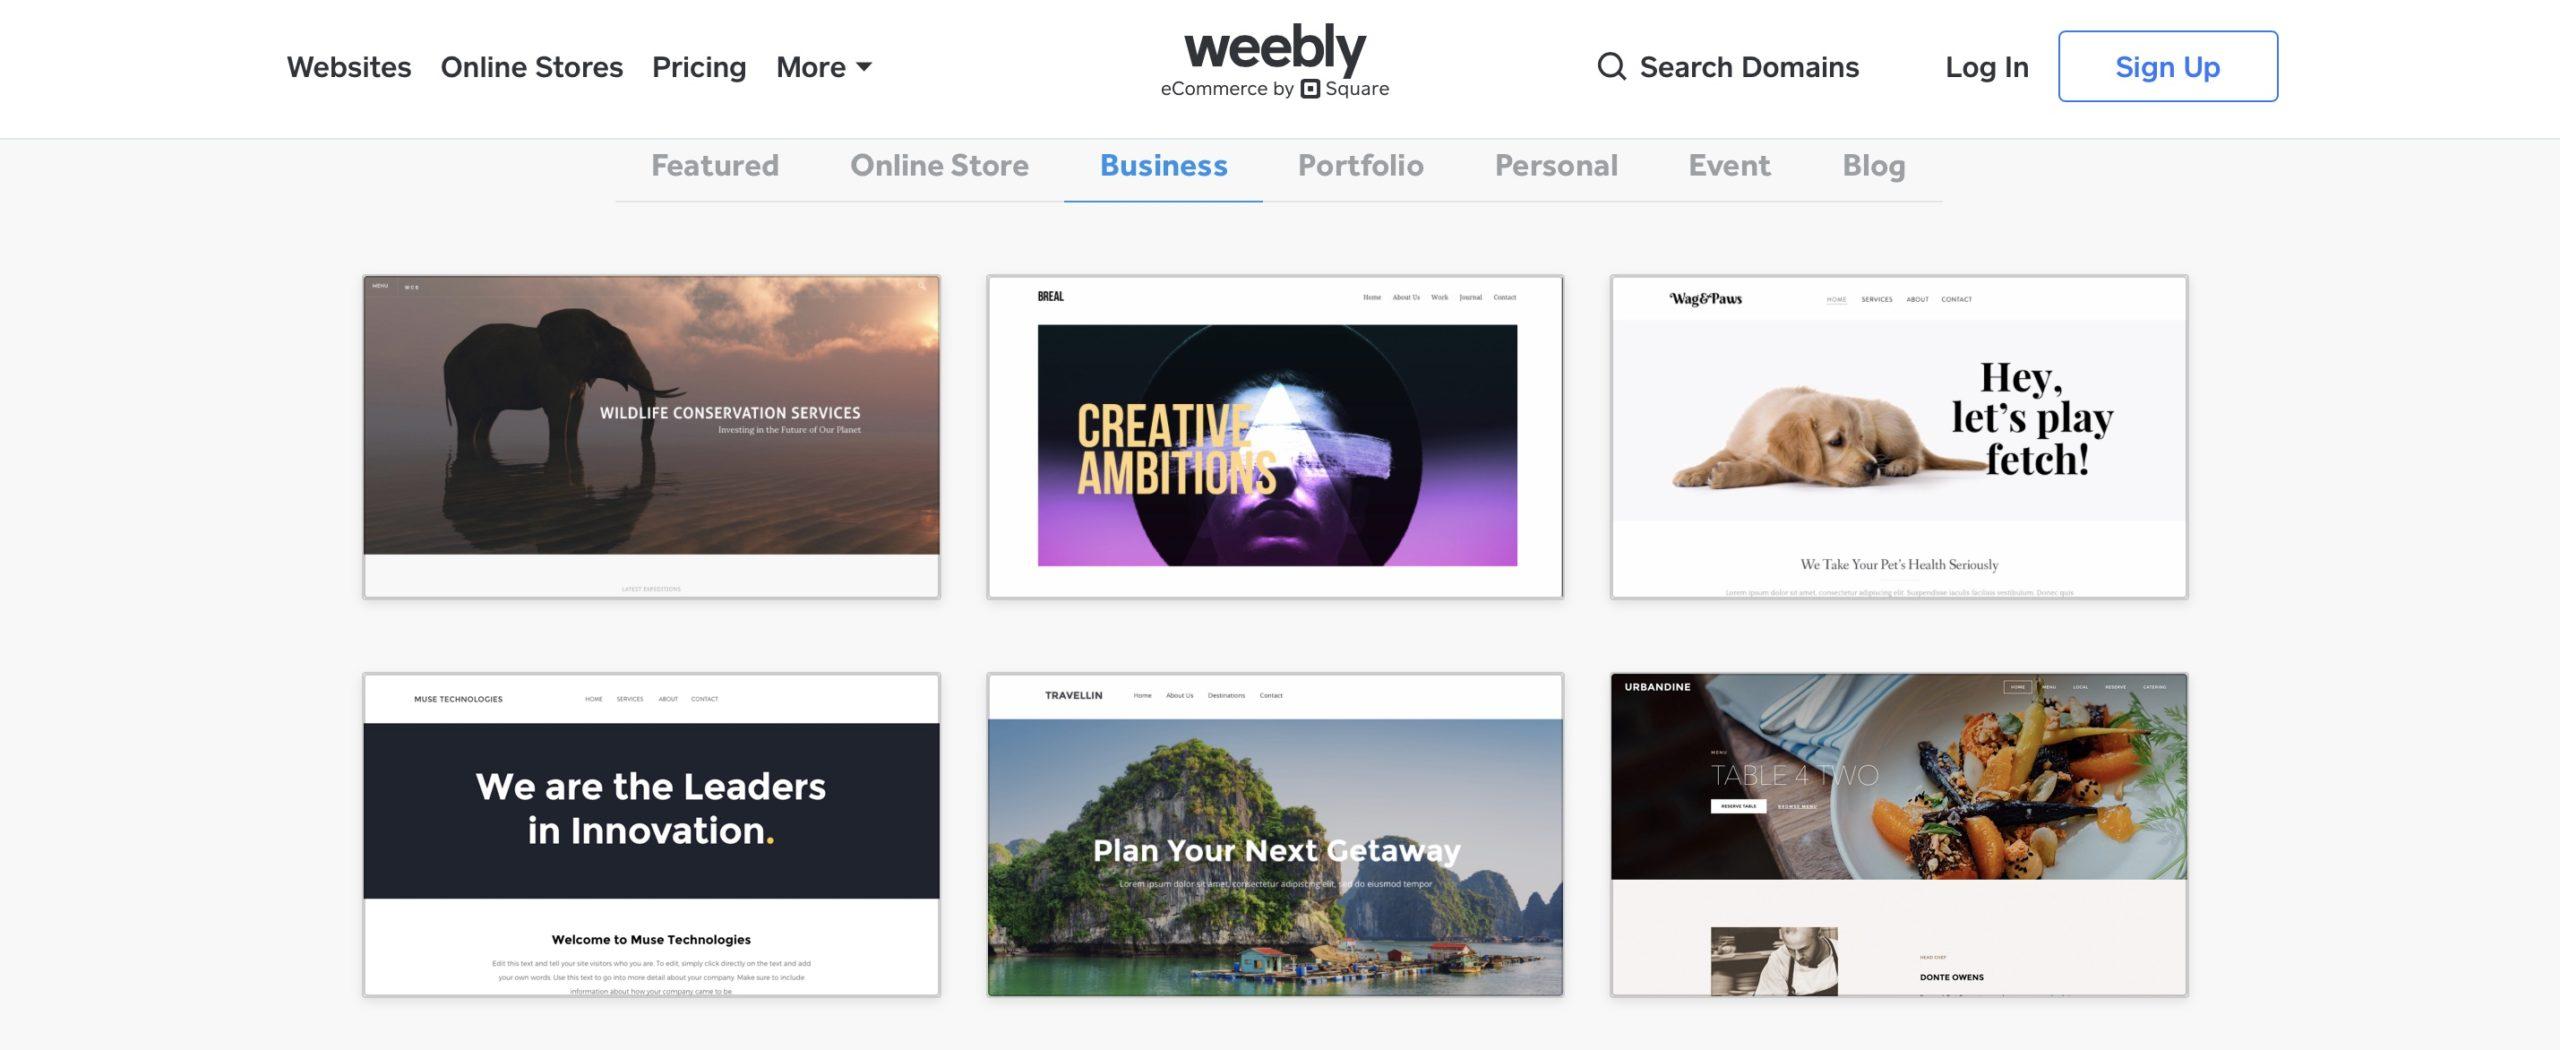 Weebly templates sample screenshot